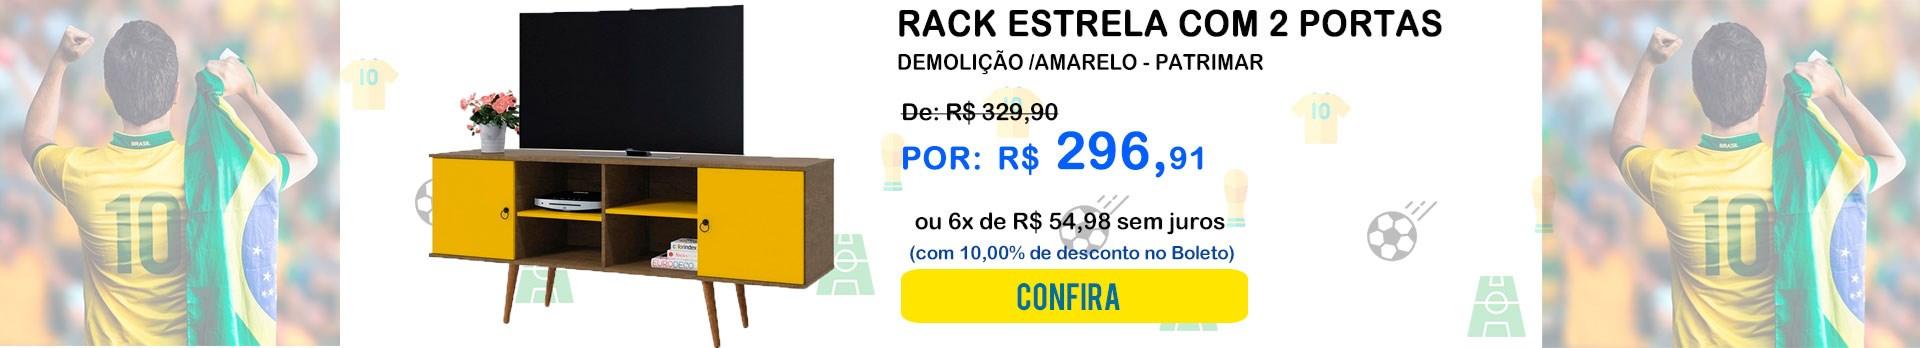 Rack Estrela - Patrimar